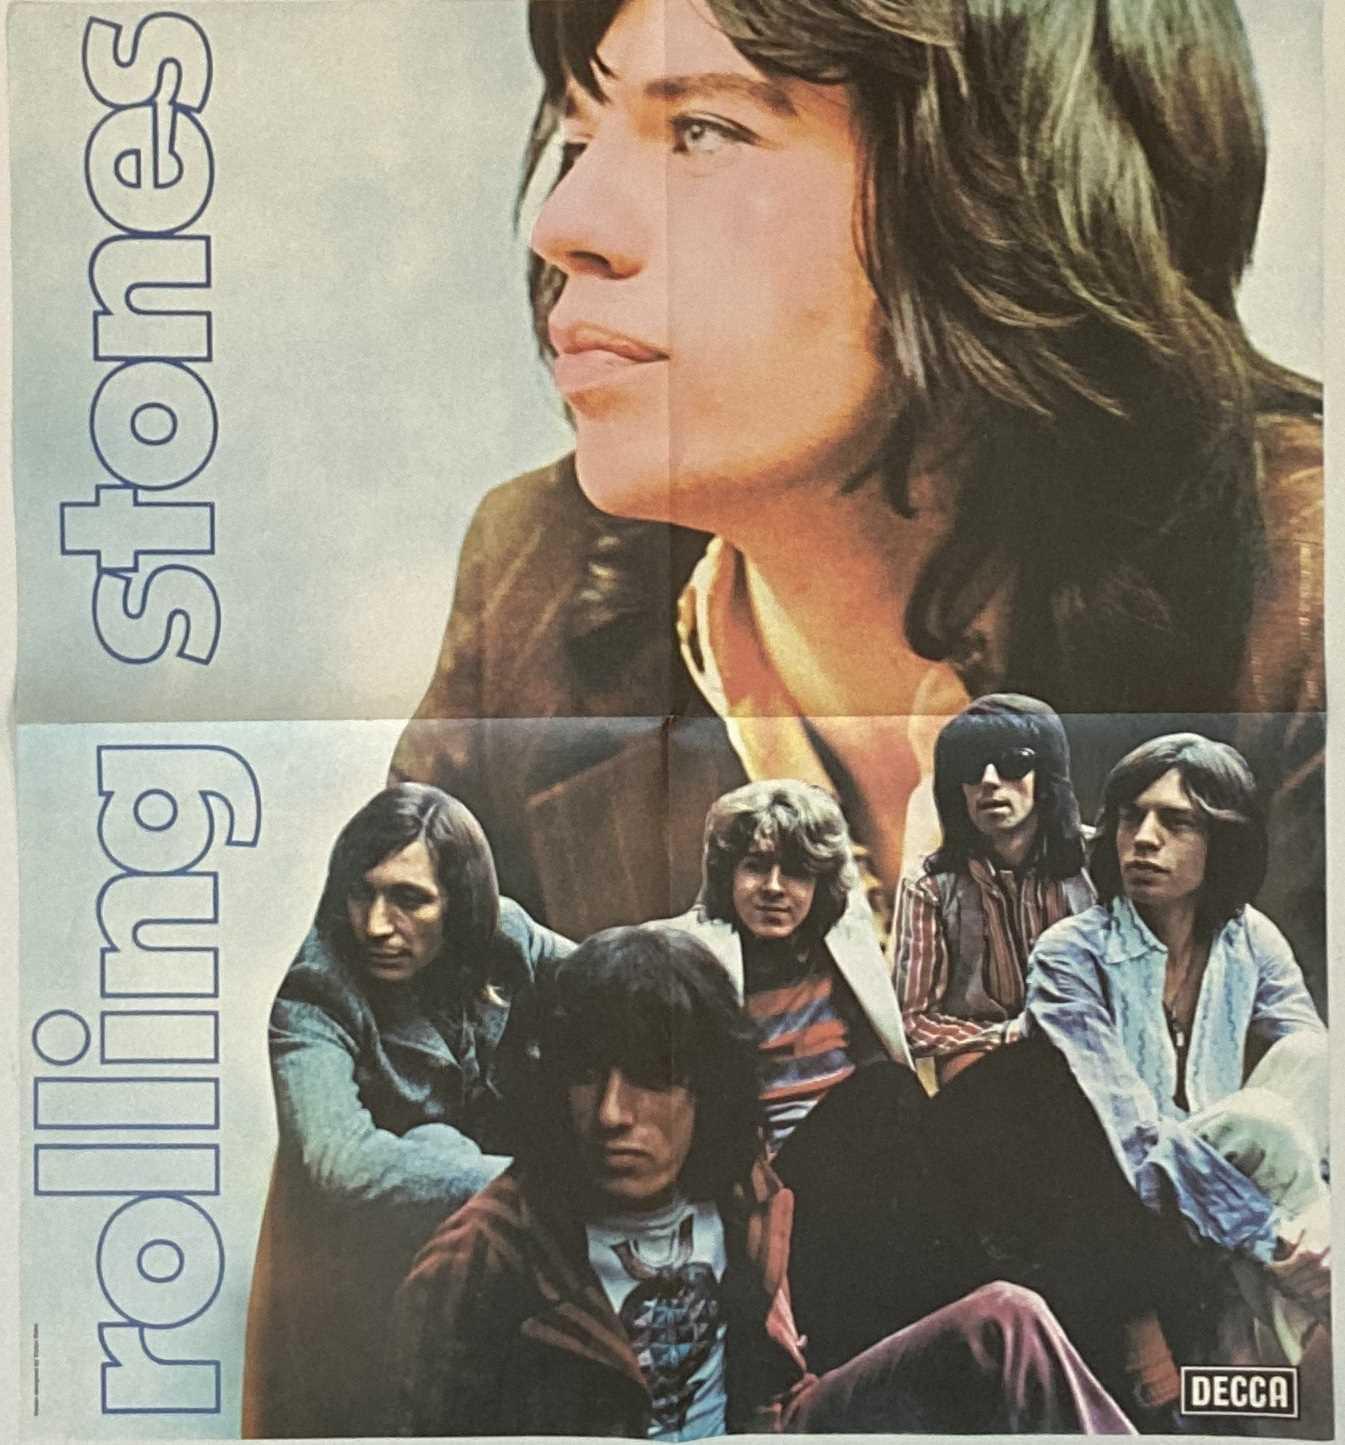 THE ROLLING STONES - LET IT BLEED LP (COMPLETE ORIGINAL UK COPY) - Image 6 of 6